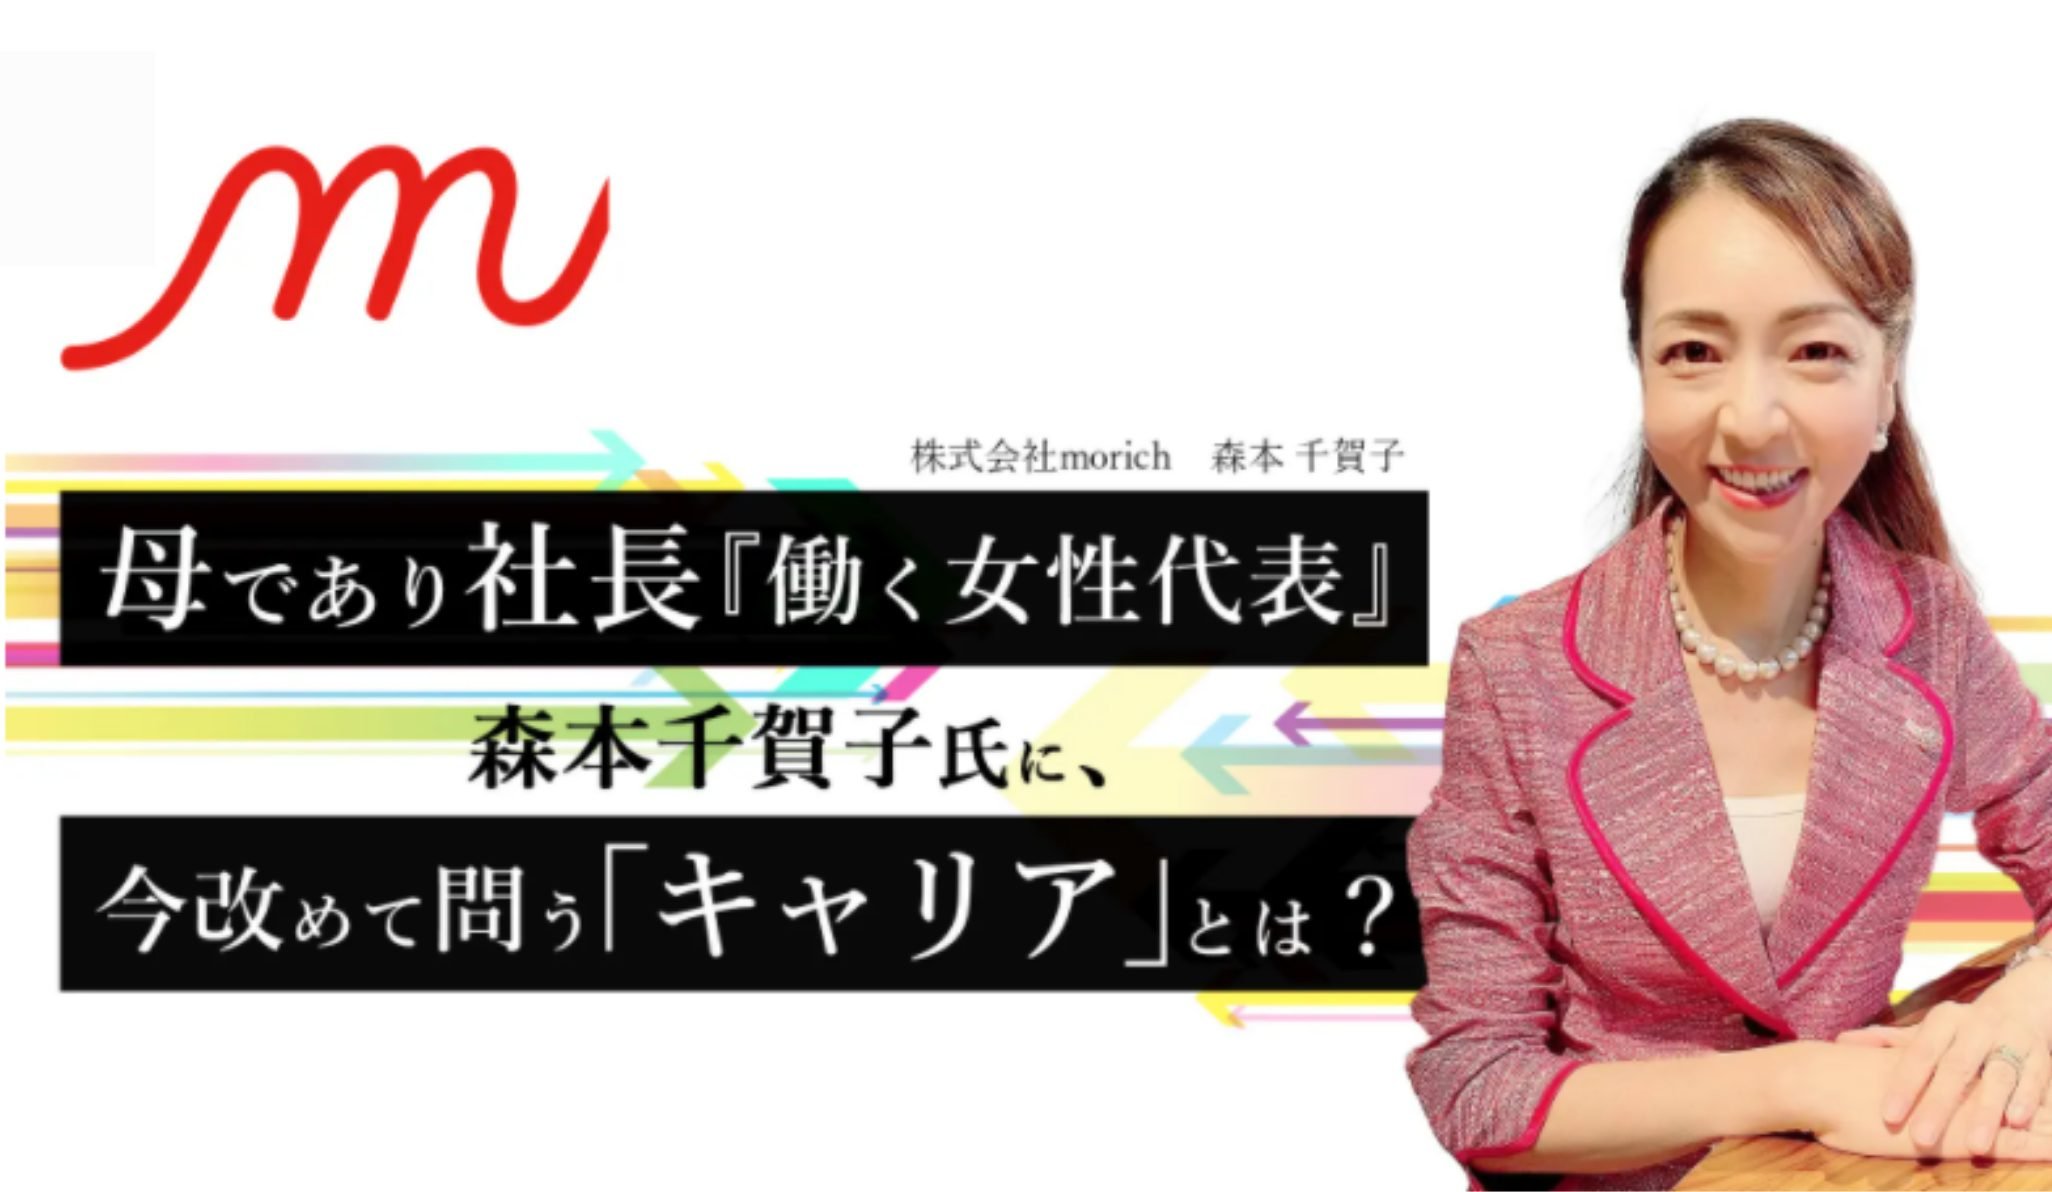 【SeminarShelf(セミナー動画プラットフォーム)】母であり社長 『働く女性代表』森本千賀子氏に、今改めて問う「キャリア」とは?